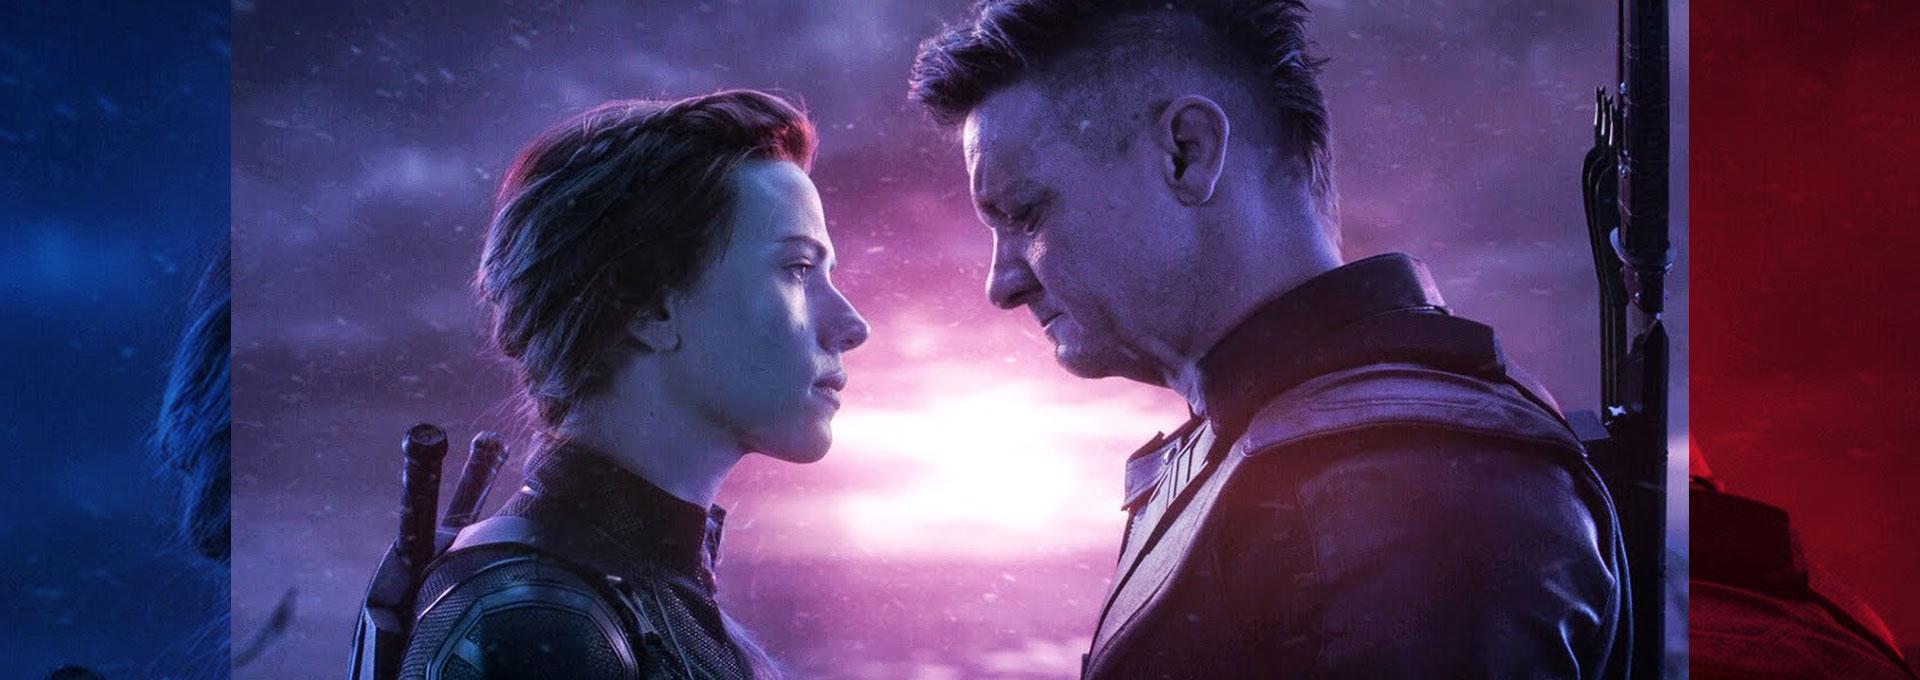 Scarlett Johansson Is Adamant That Black Widow Is Really